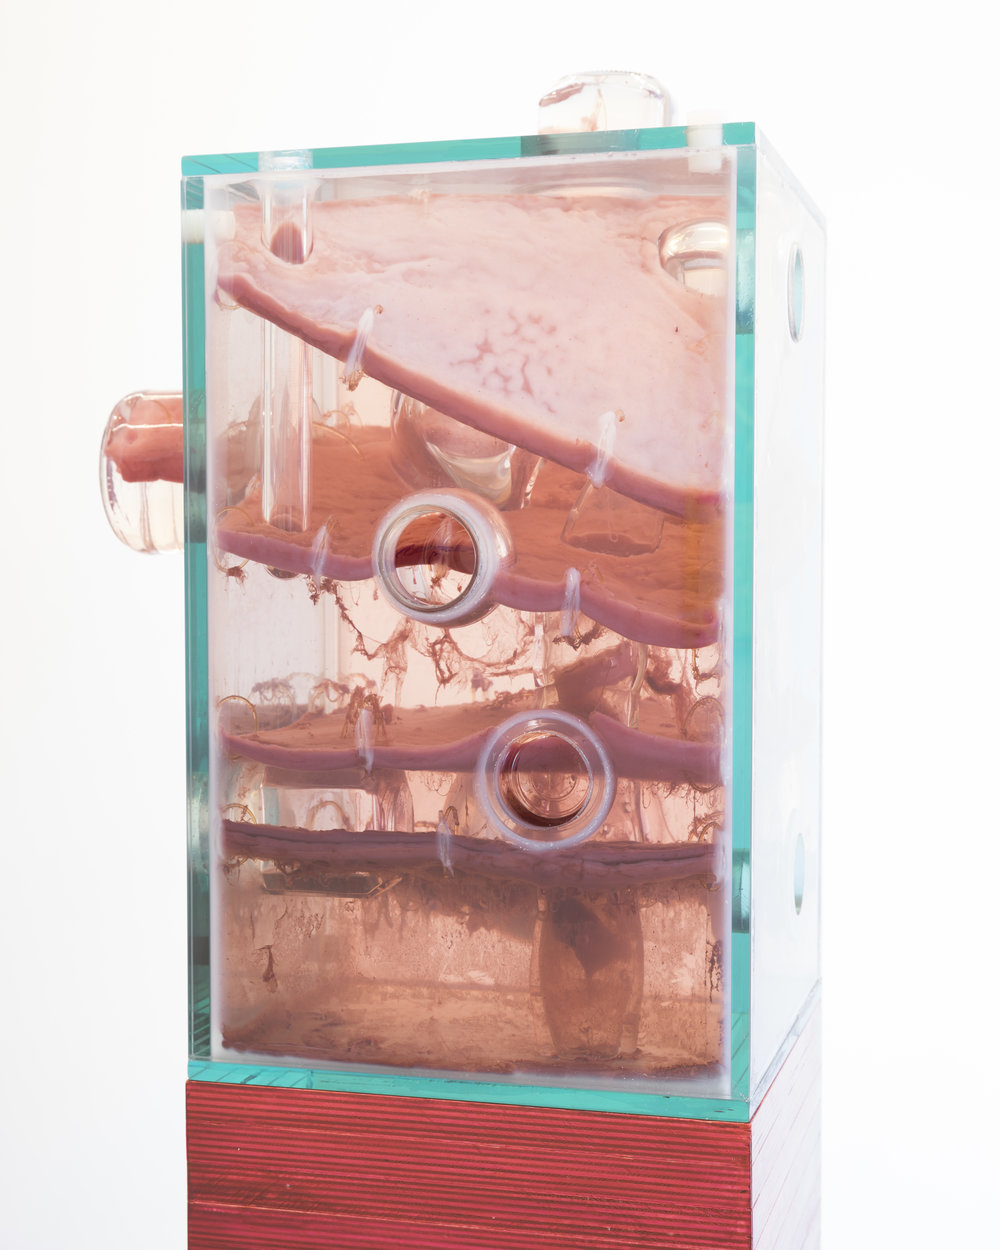 Jennifer Sirey  Mongk  2019 Glass, bacteria, vinegar, water, monofilament, plywood, paint, and OSB board 63 x 10 1/2 x 10 1/2 inches